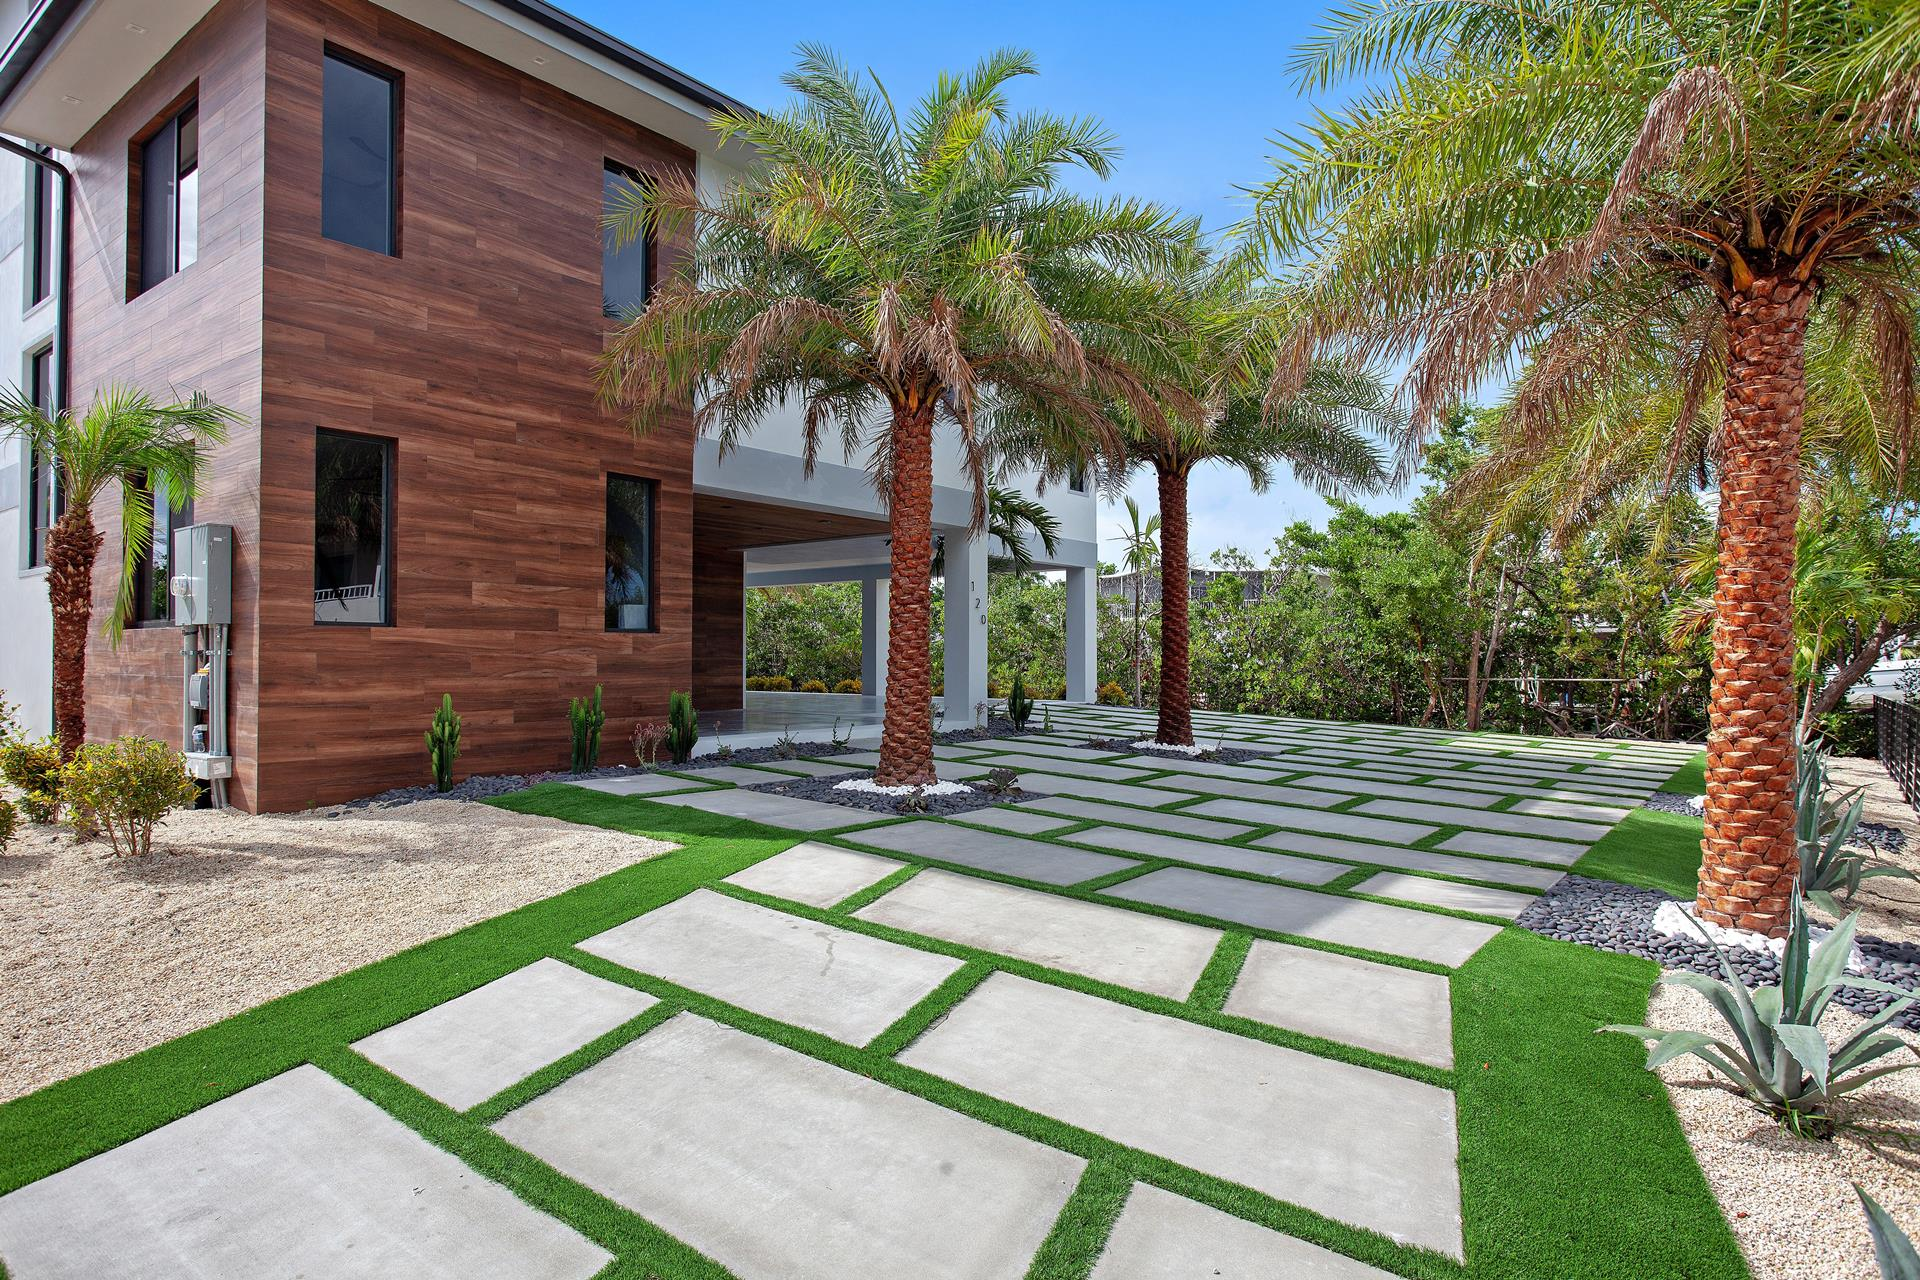 120 Willow LN - Other City - Keys/Islands/Caribbean, Florida